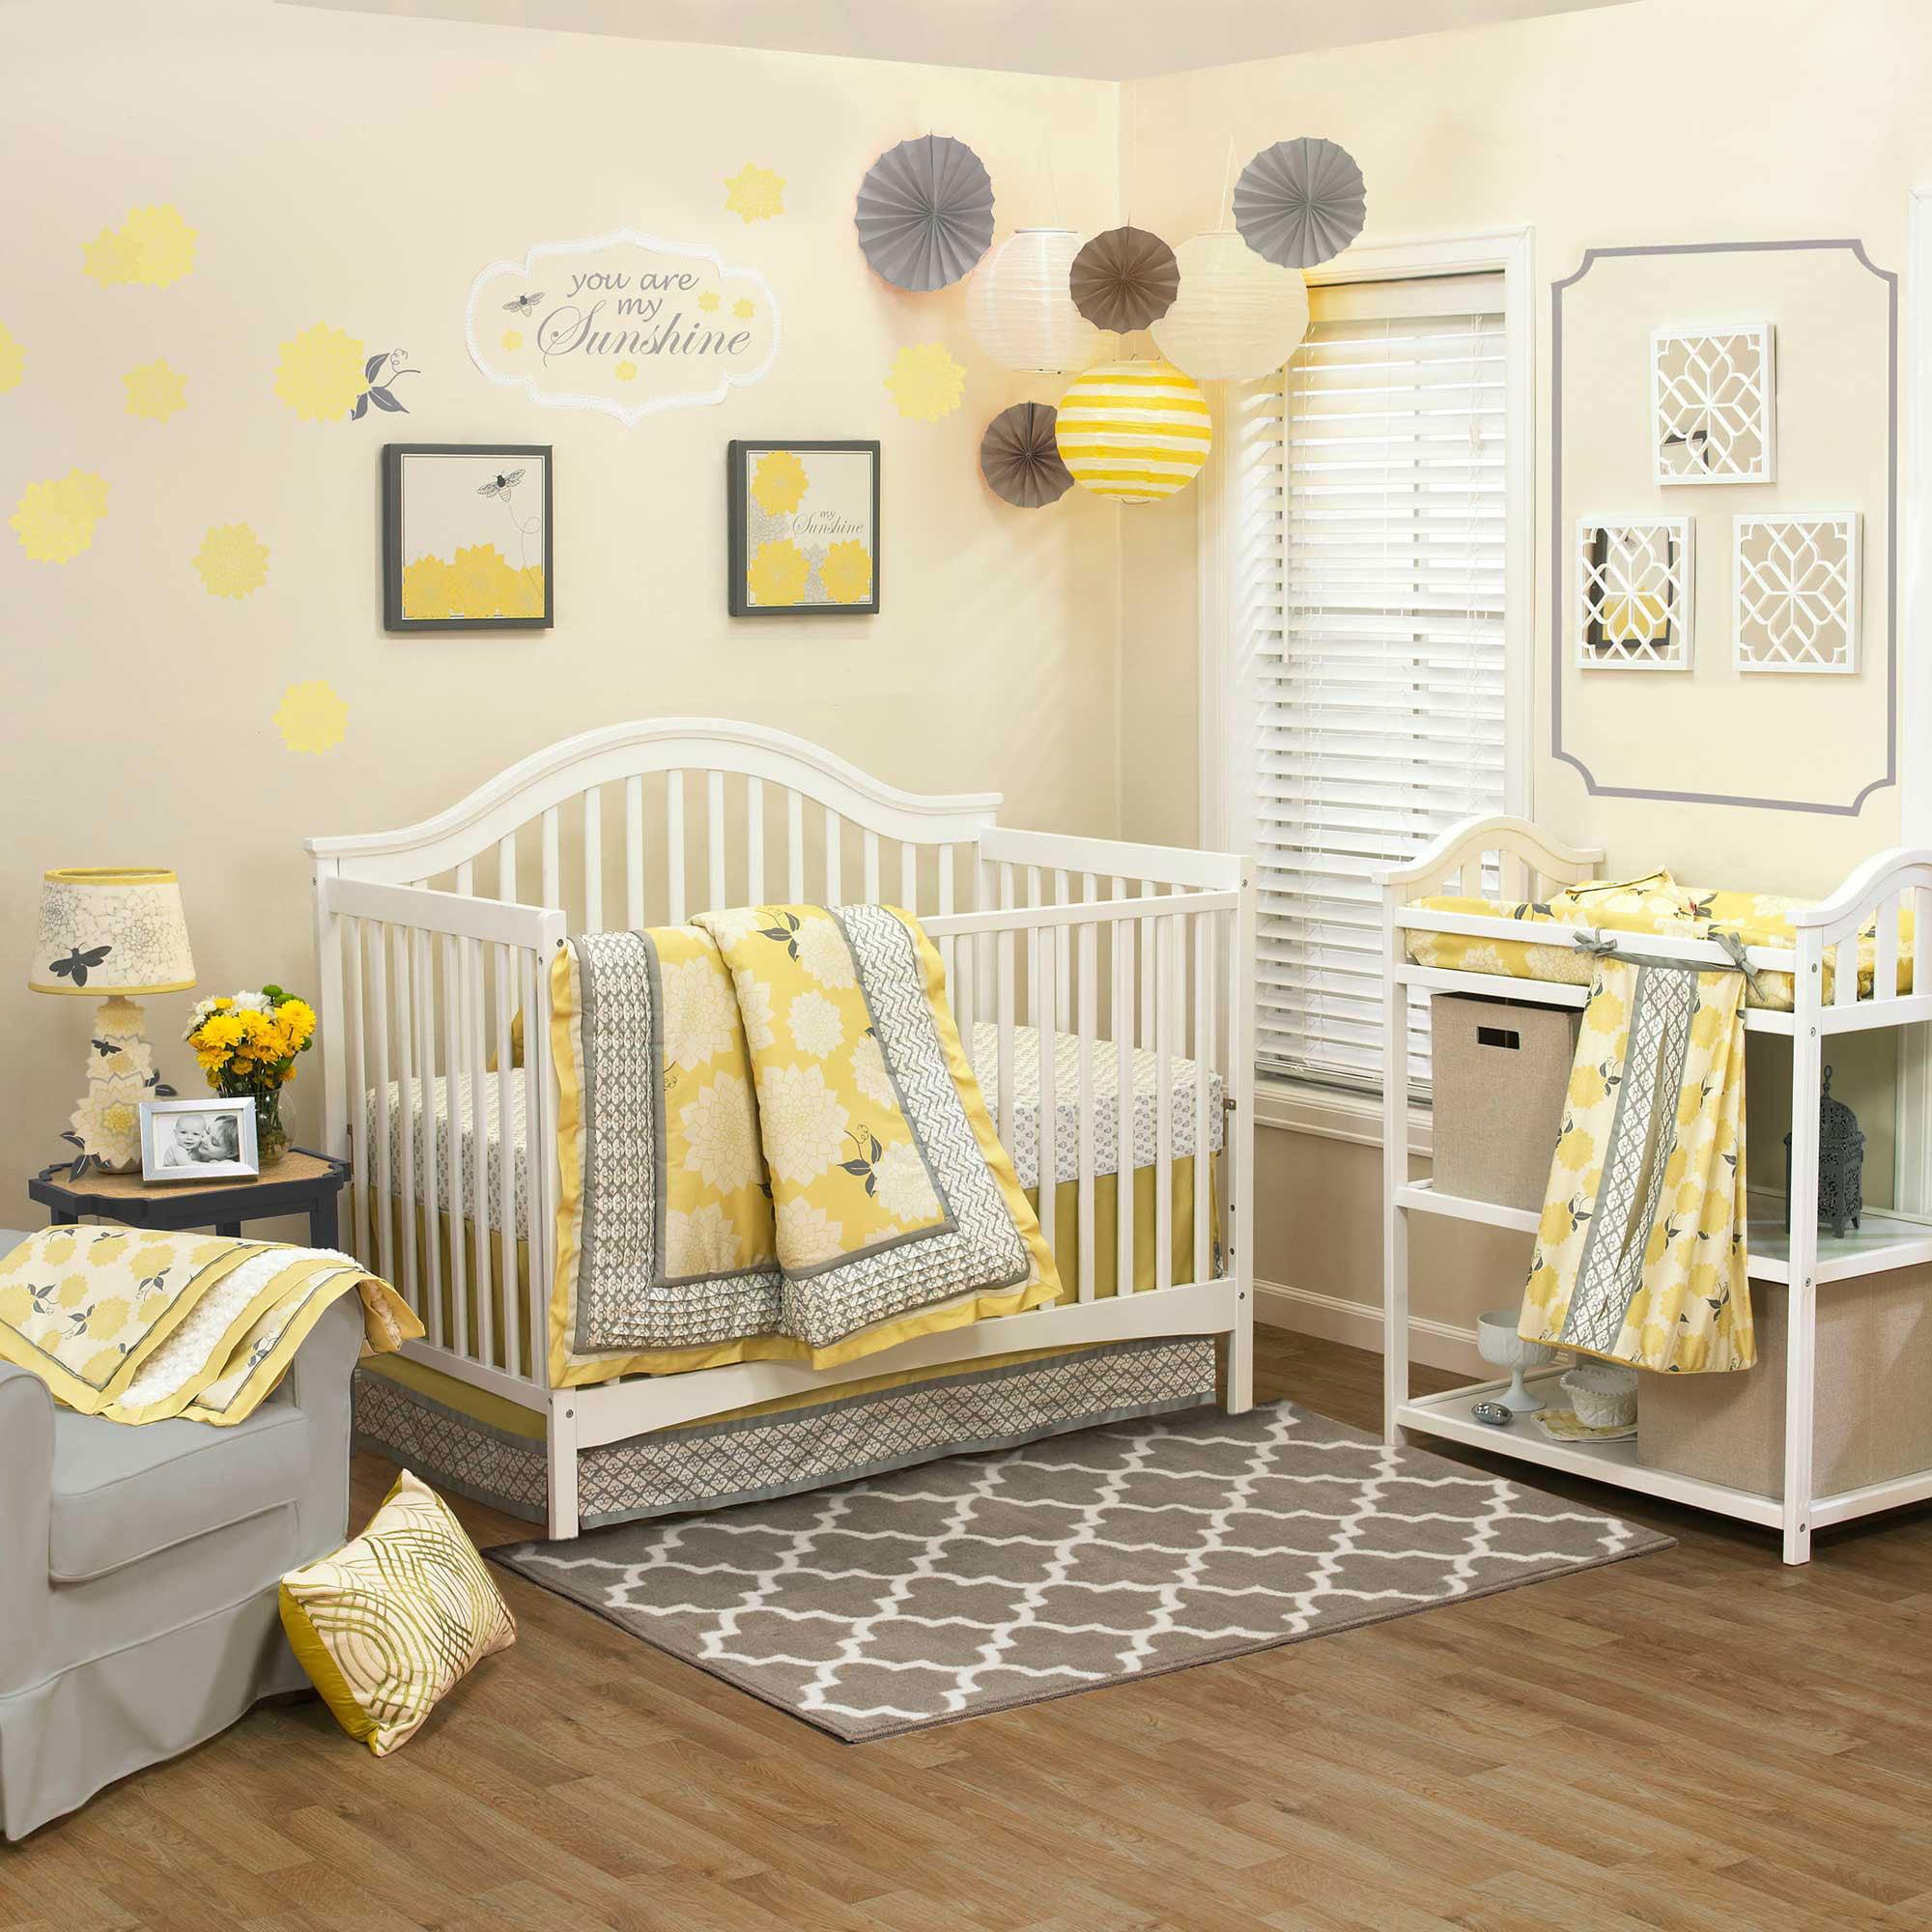 Baby cribs bedding sets - Baby Cribs Bedding Sets 43